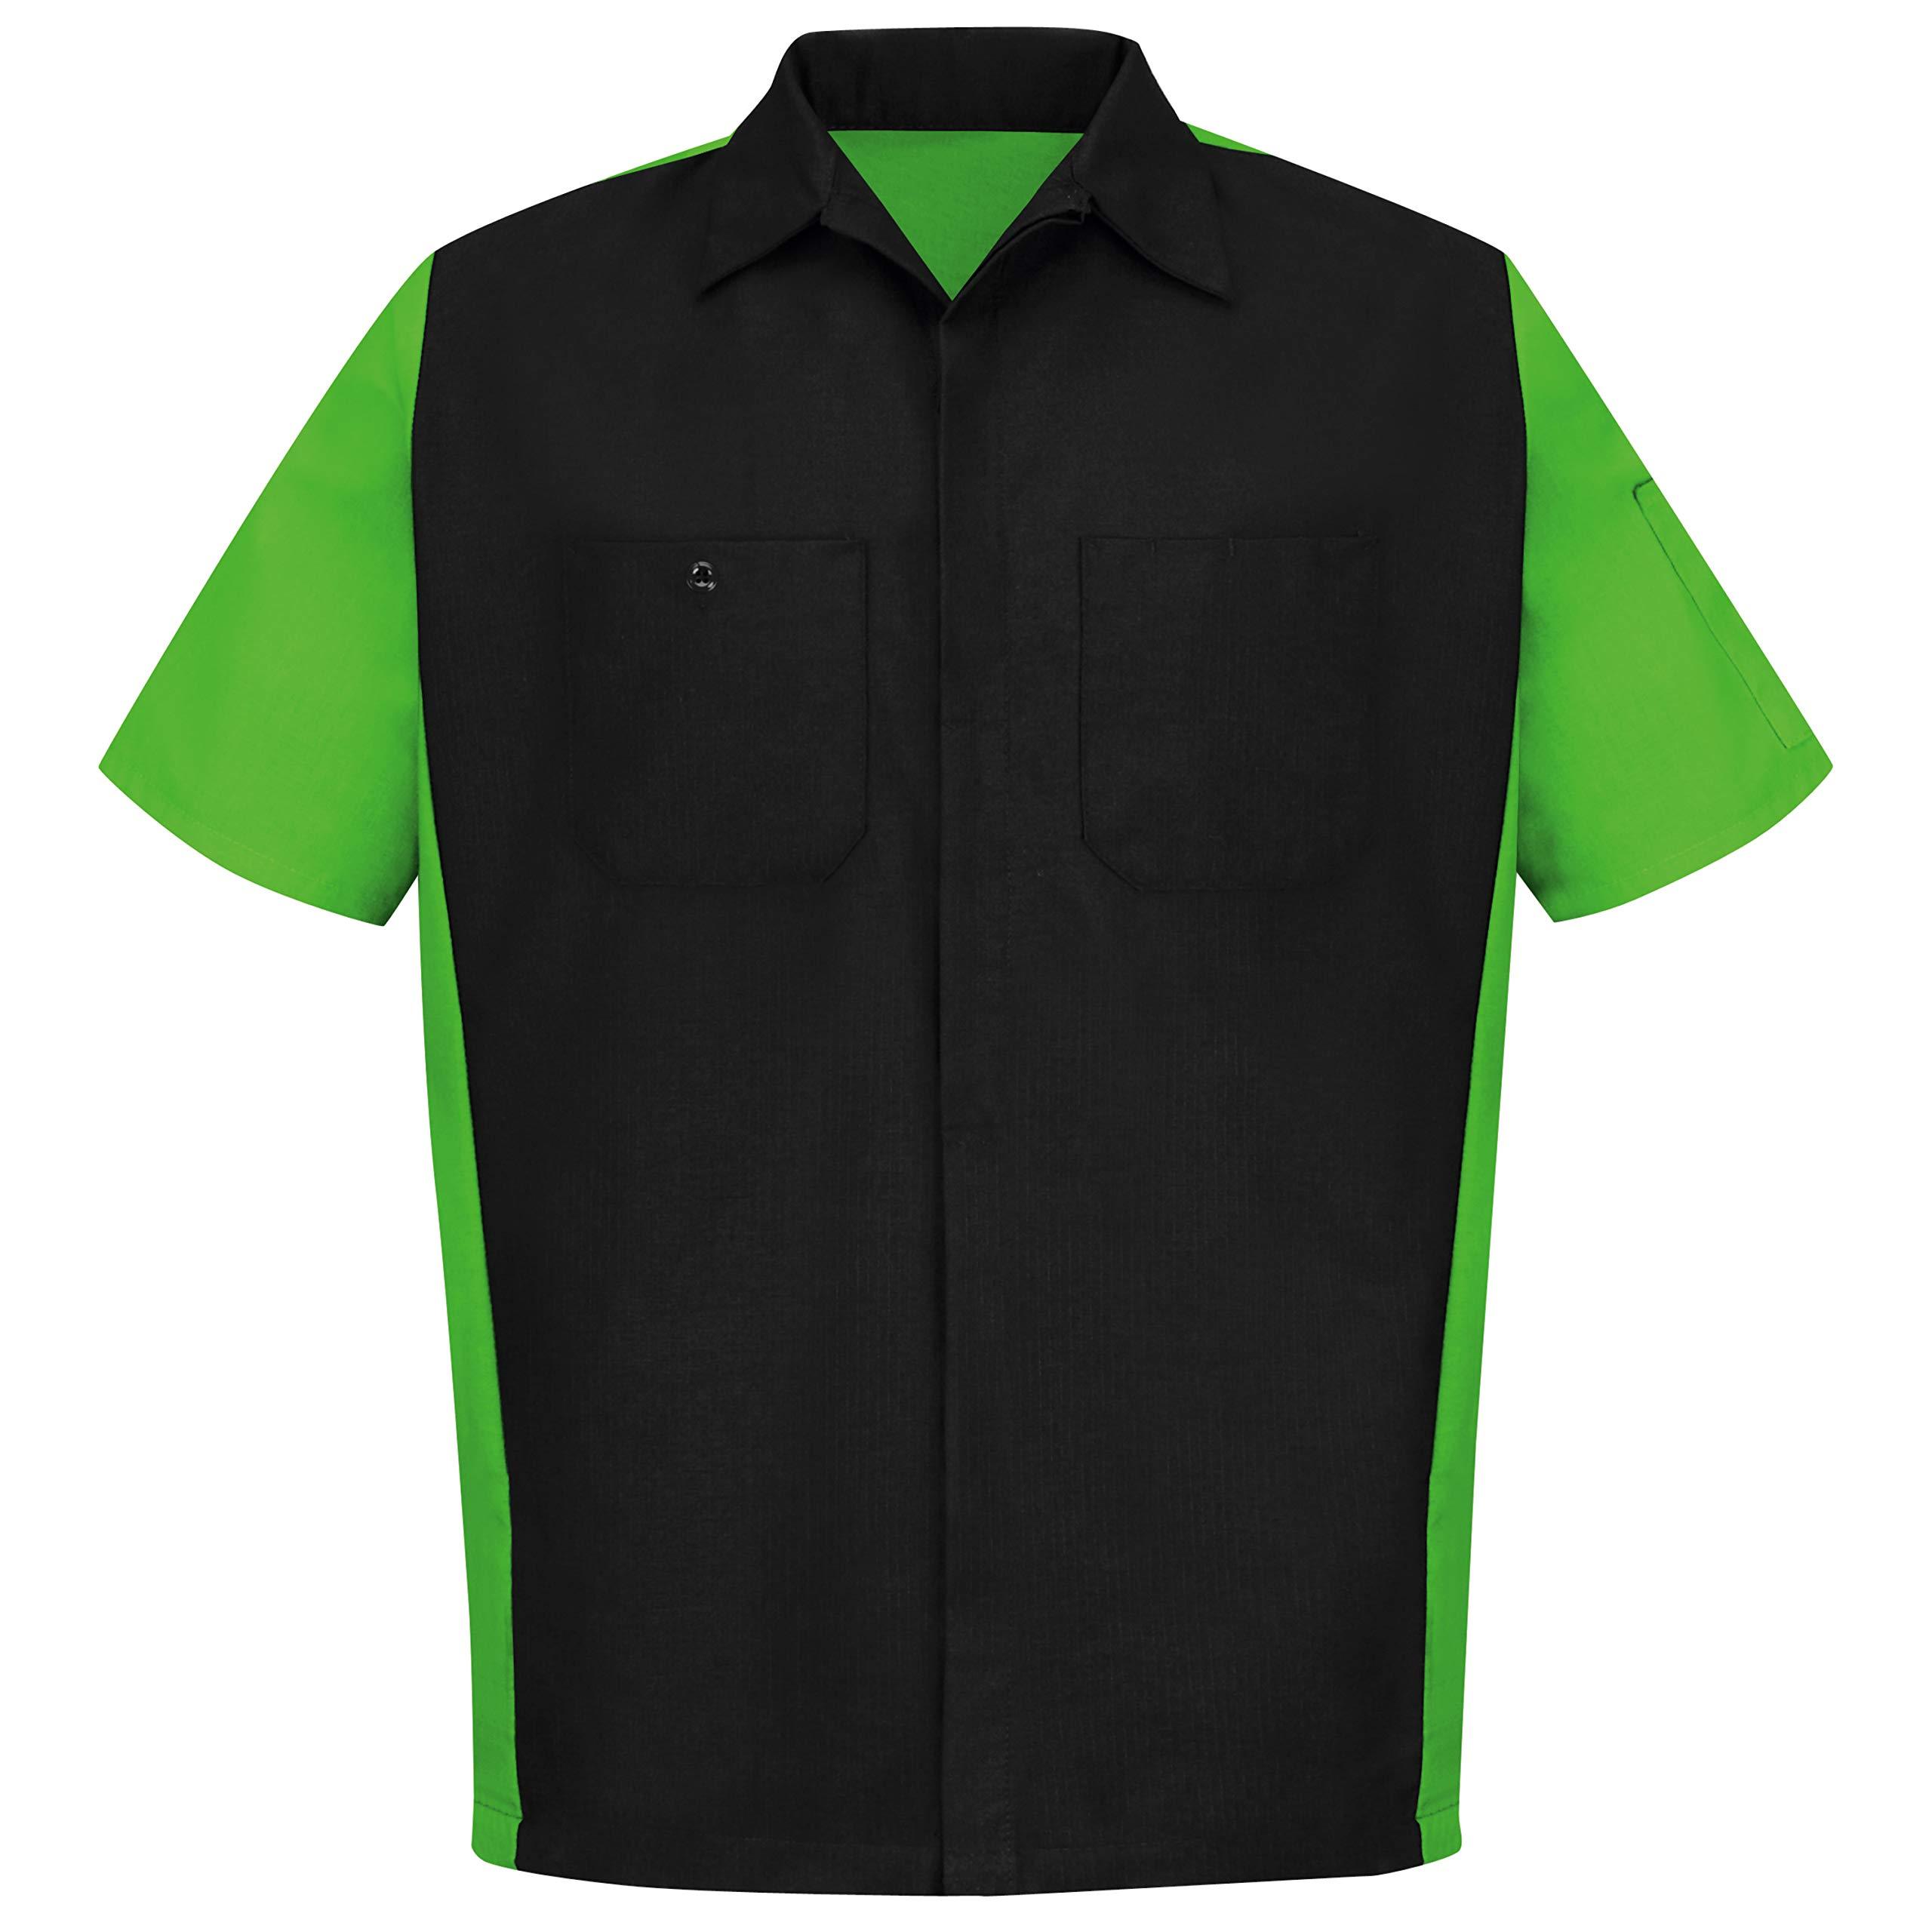 Red Kap Short Sleeve Two-Tone Crew Shirt